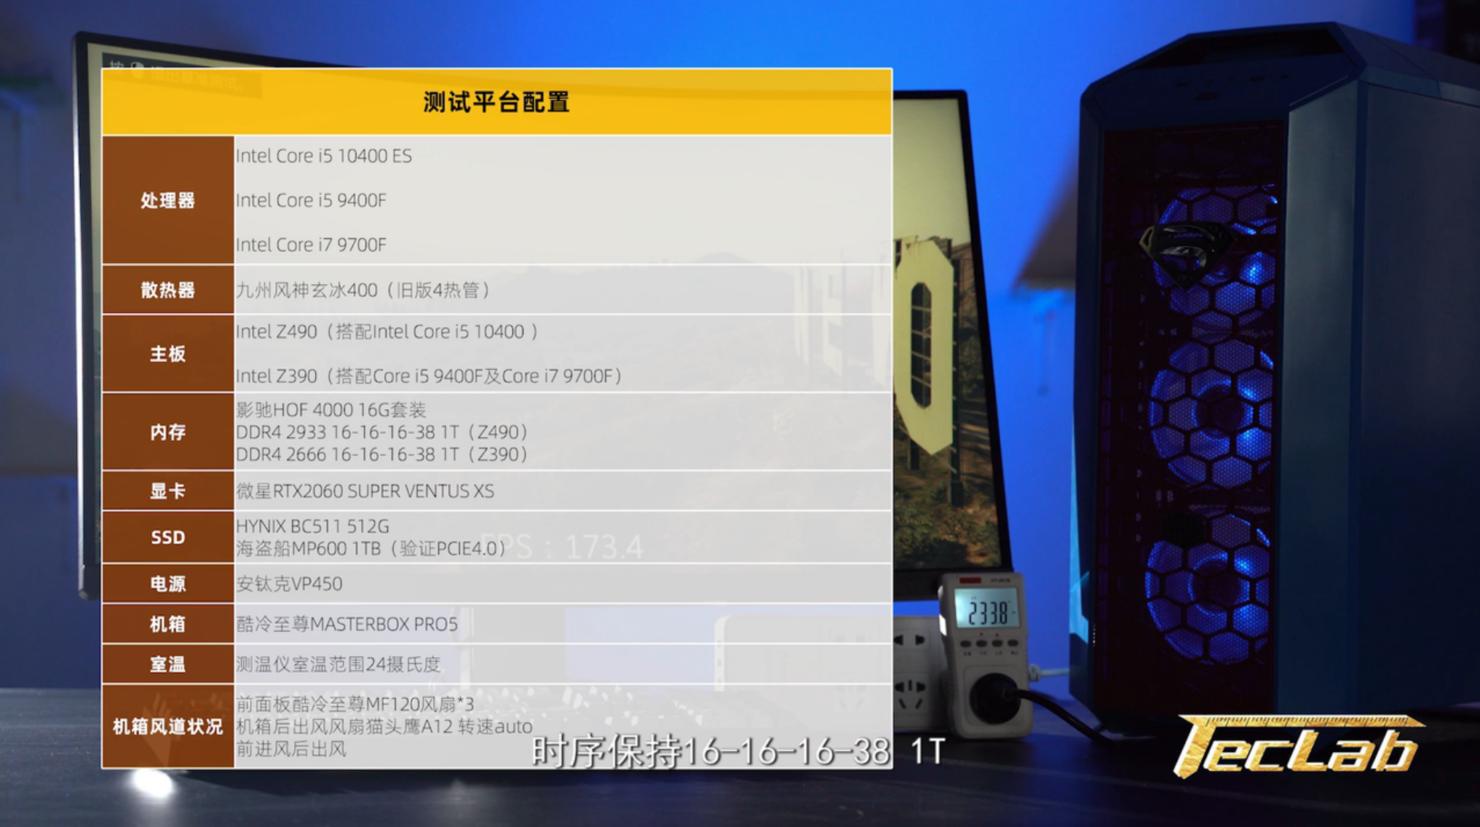 intel-core-i5-10400-comet-lake-s-6-core-desktop-cpu_test-setup